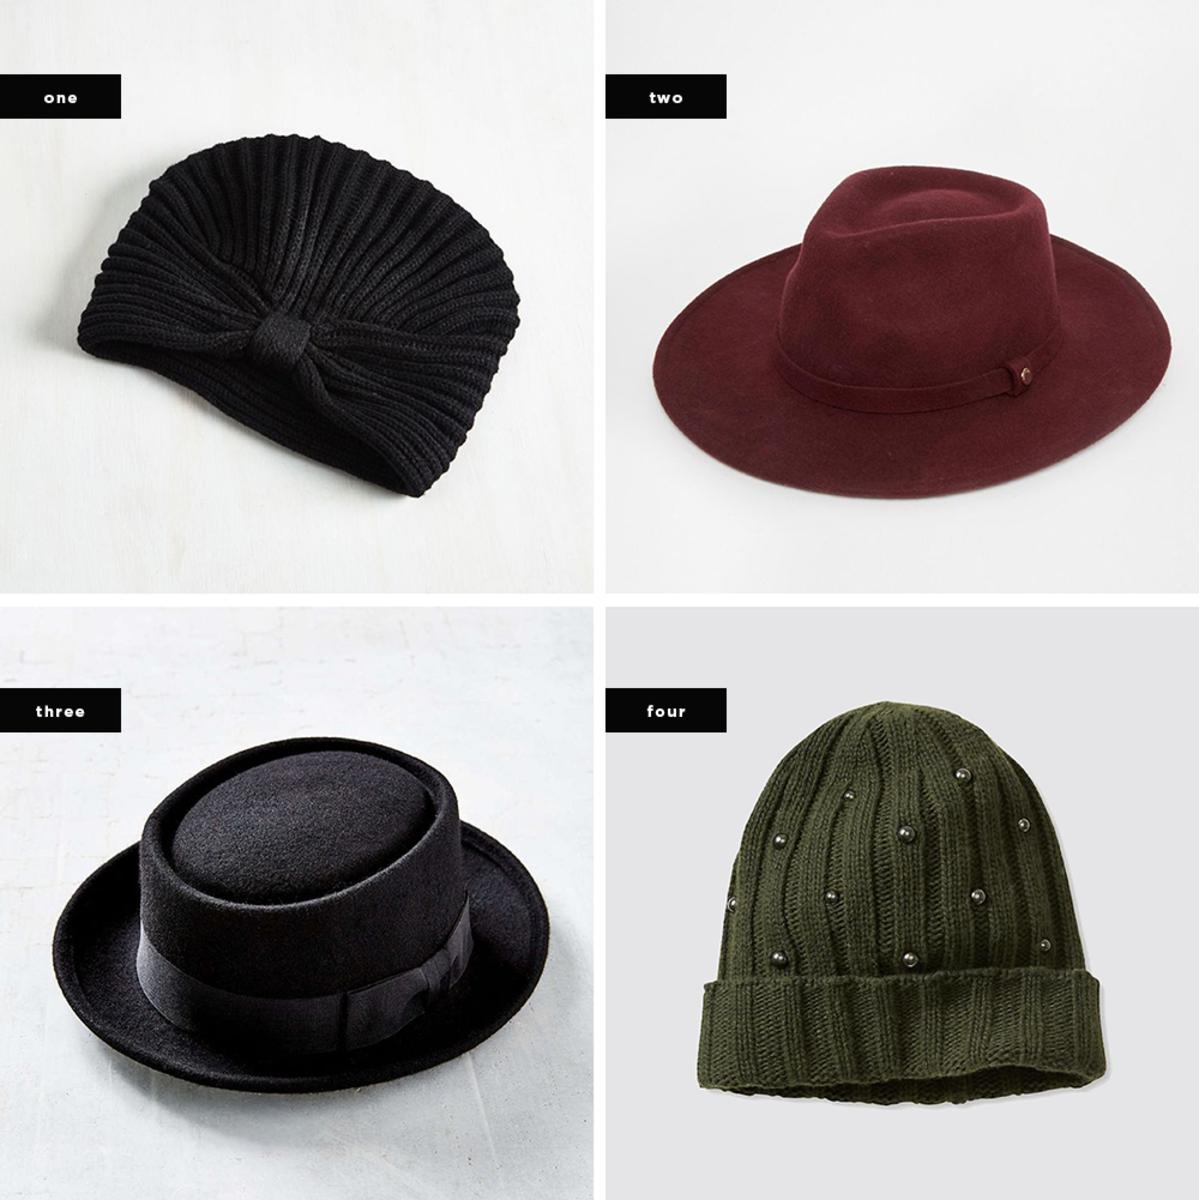 1. ModCloth, $16/ 2. Asos, $108 / 3. Urban Outfitters, $39 / 4. Banana Republic, $50